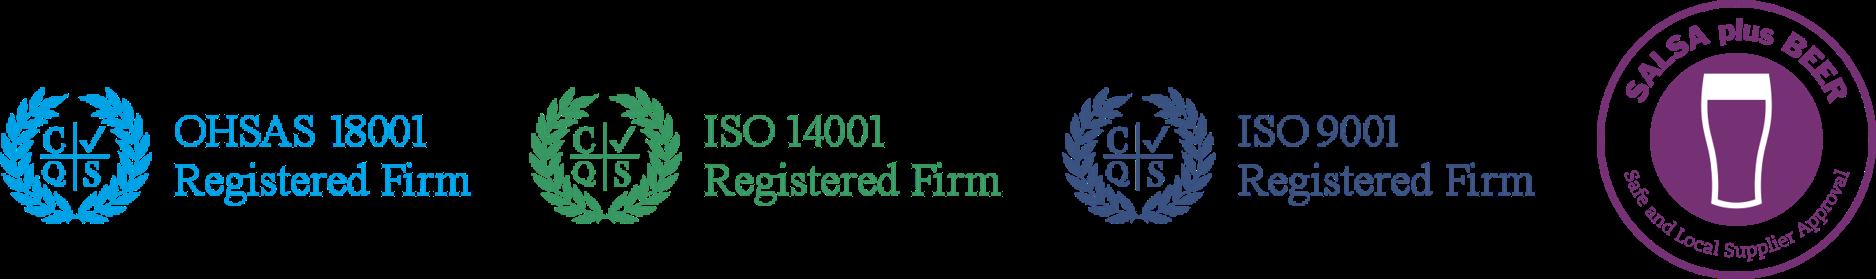 ISO logos plus SALSA.png